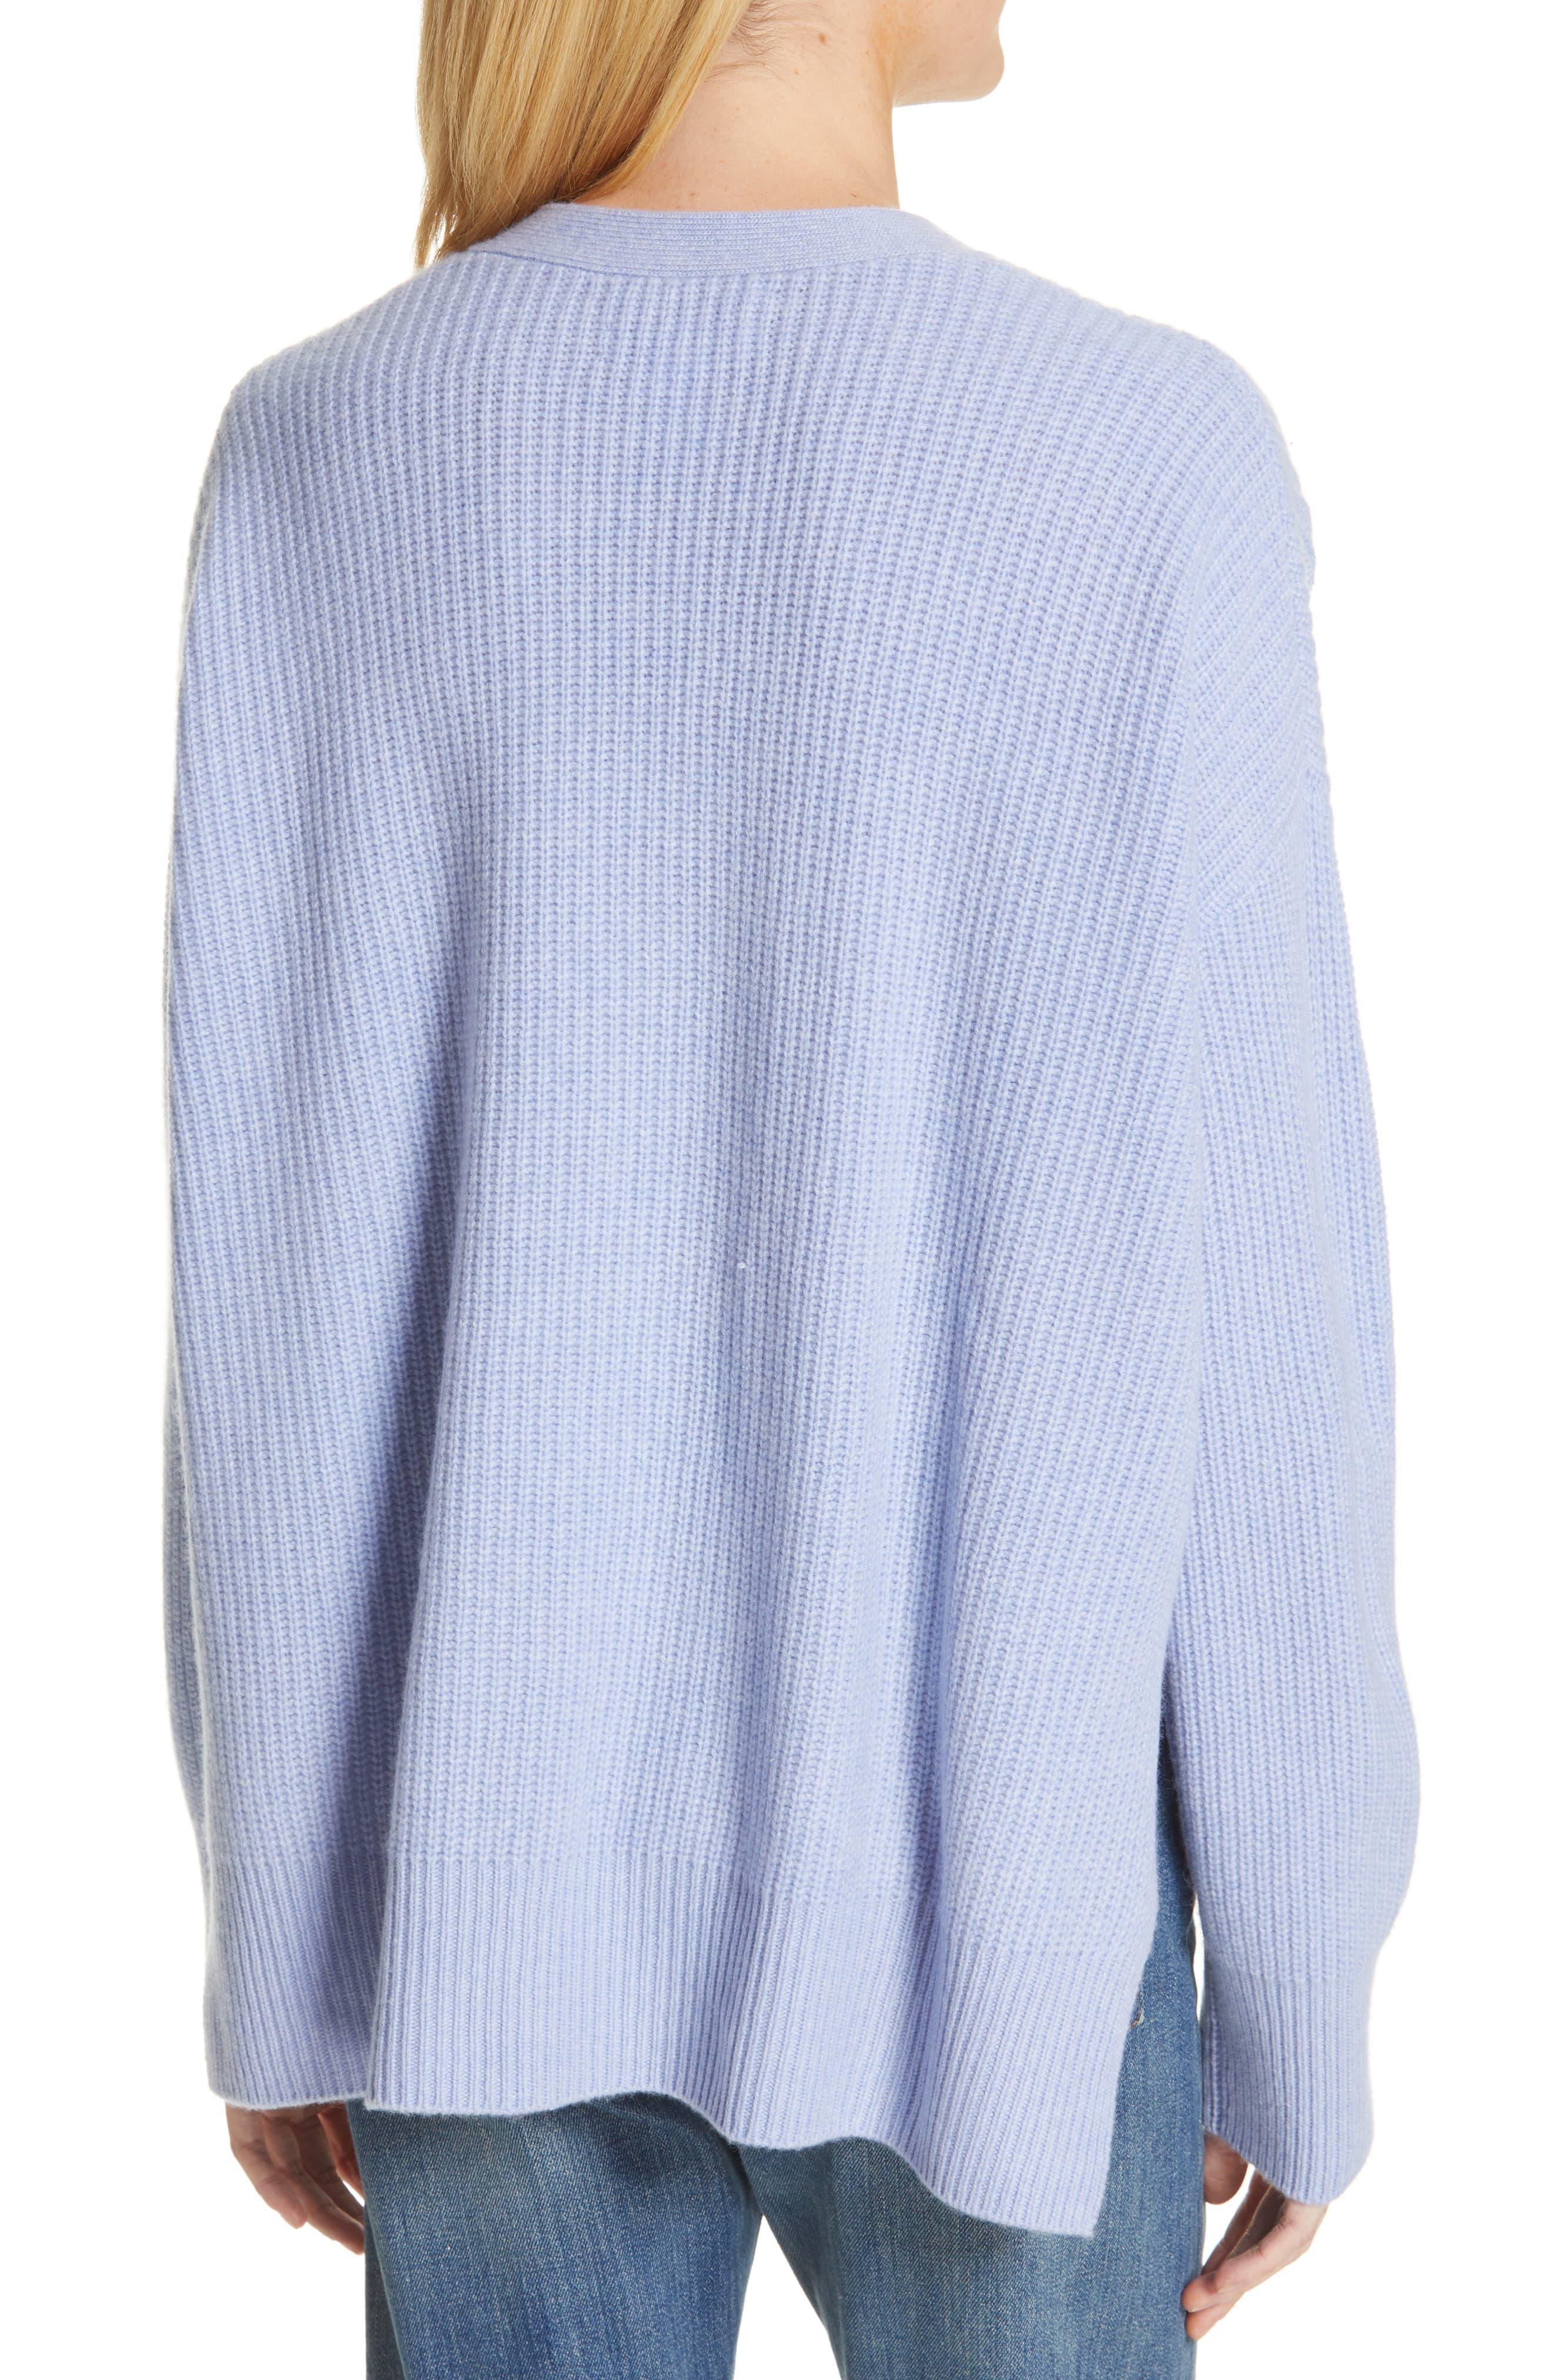 NORDSTROM SIGNATURE, Cashmere Pocket Cardigan, Alternate thumbnail 2, color, BLUE LUSTRE HEATHER